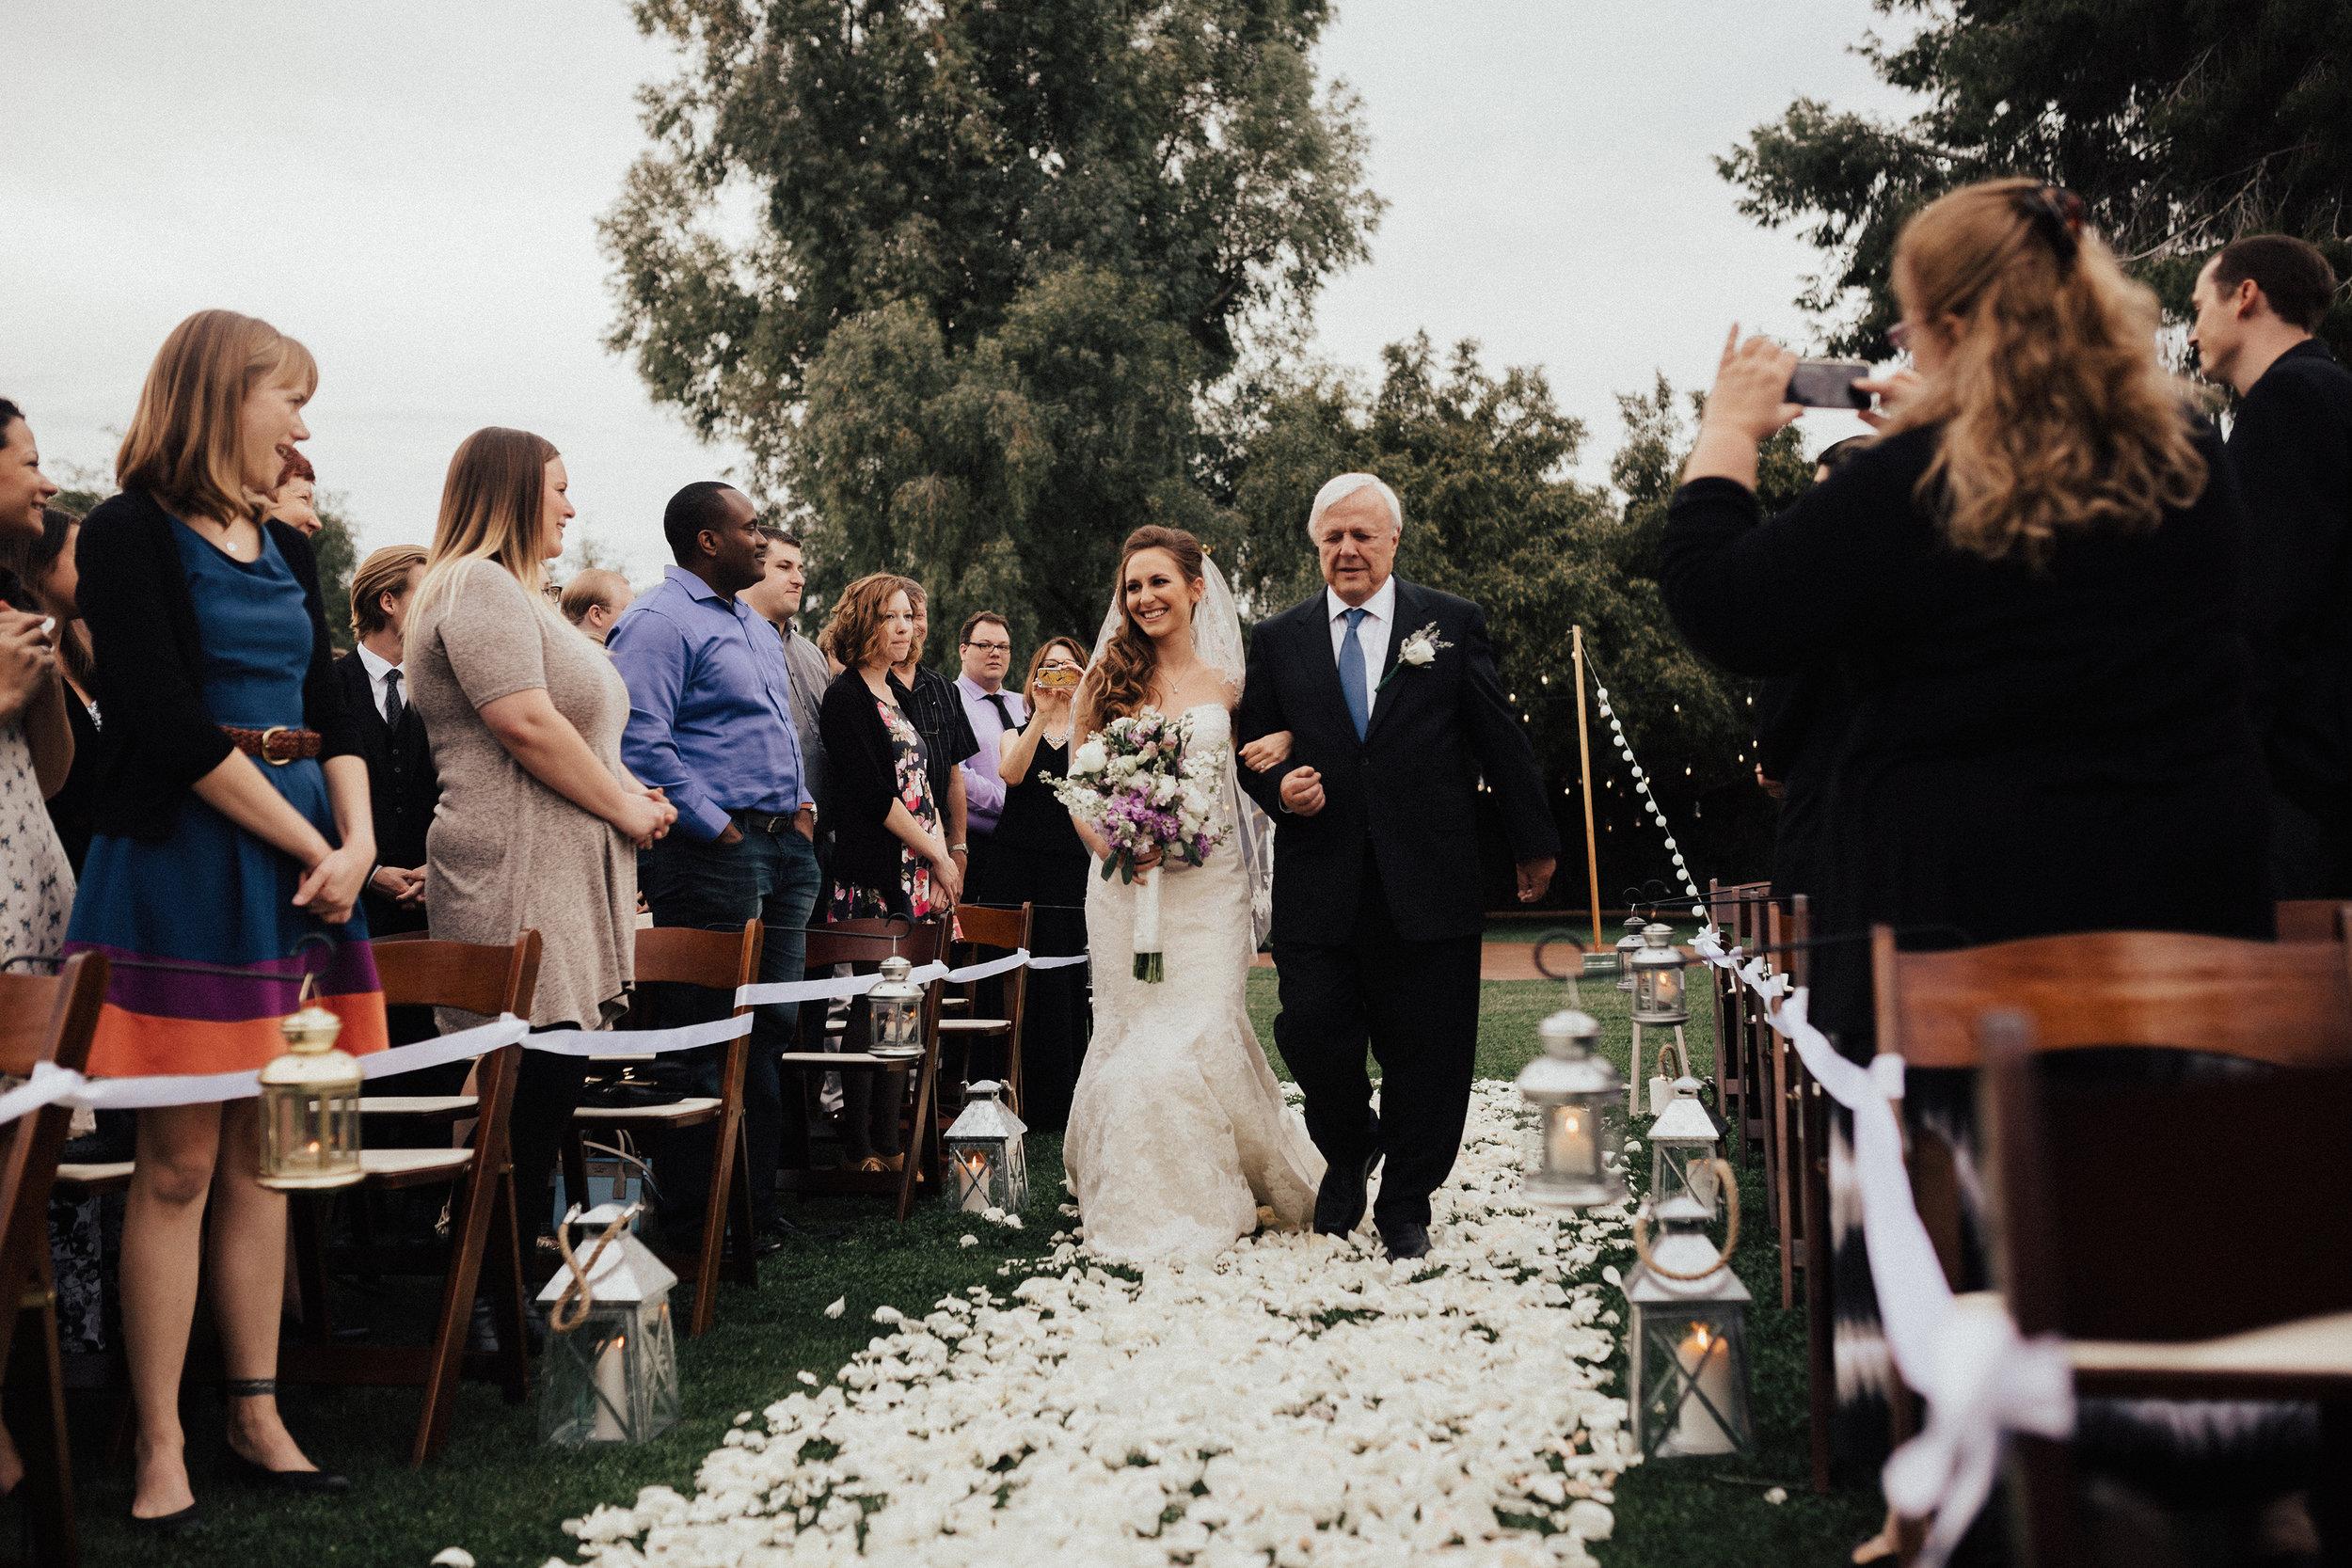 Lydia_Chris_Ceremony (44).jpg